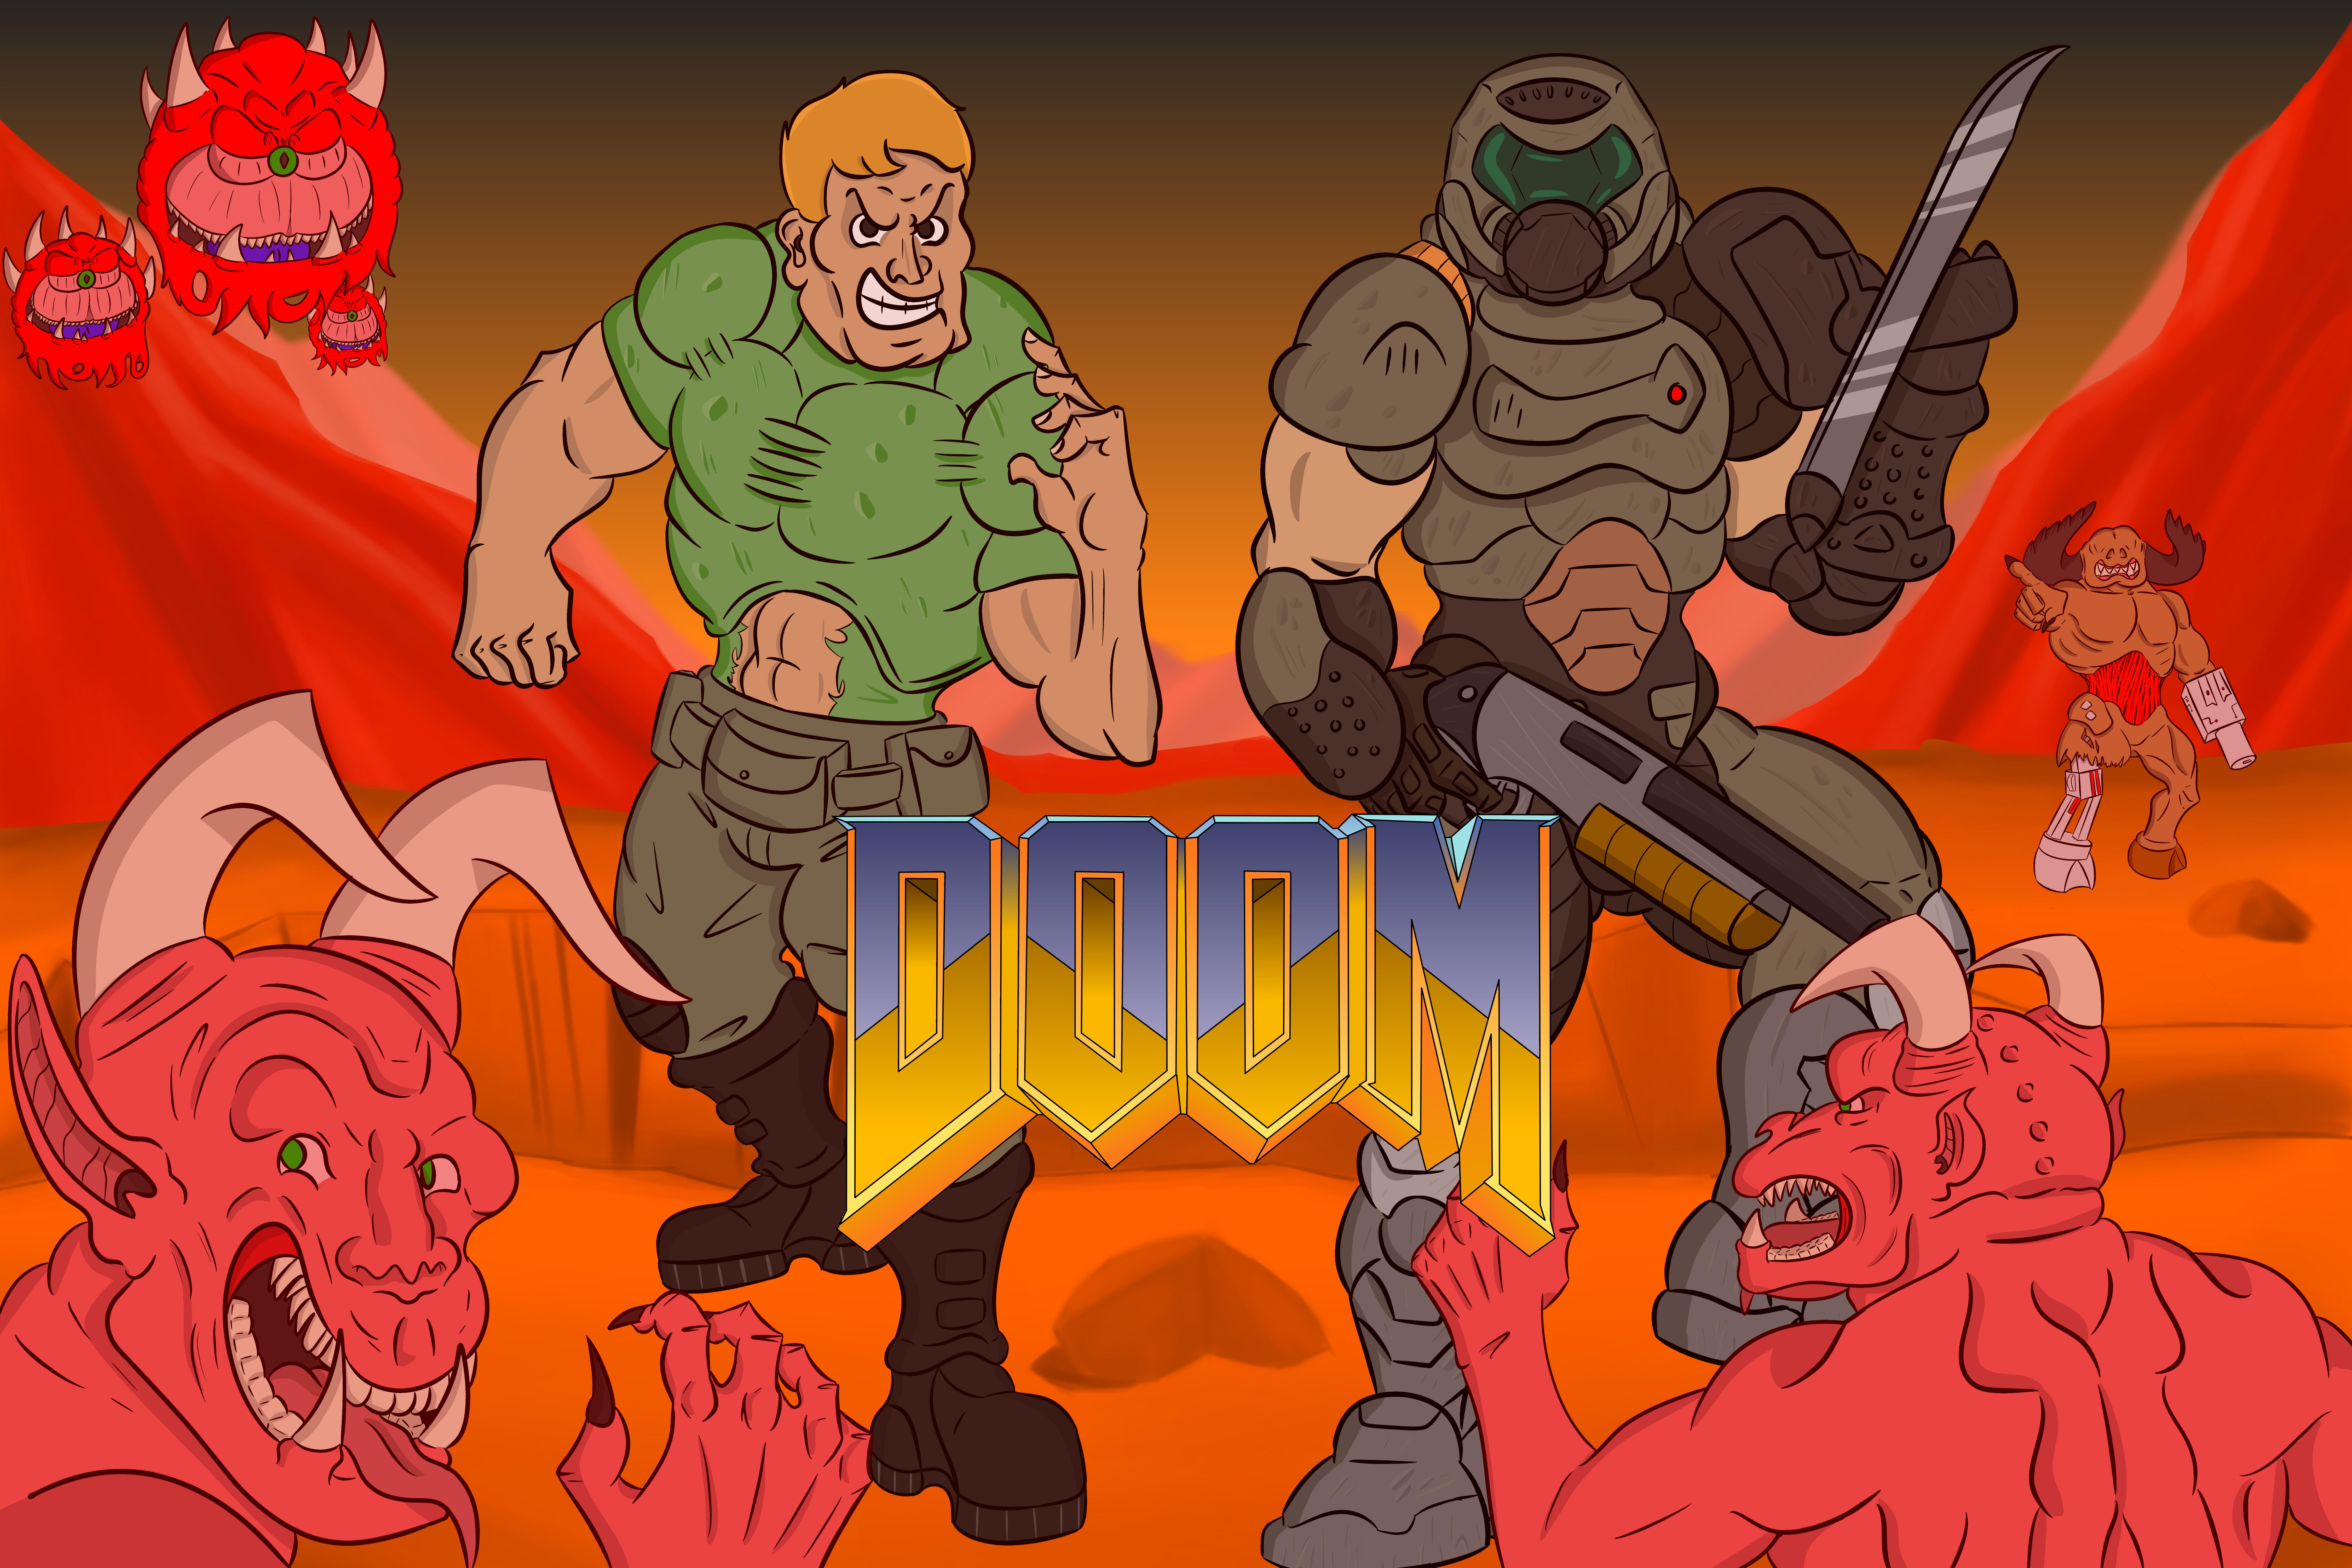 Doom Guy And Doom Slayer By Sirdoubled On Newgrounds